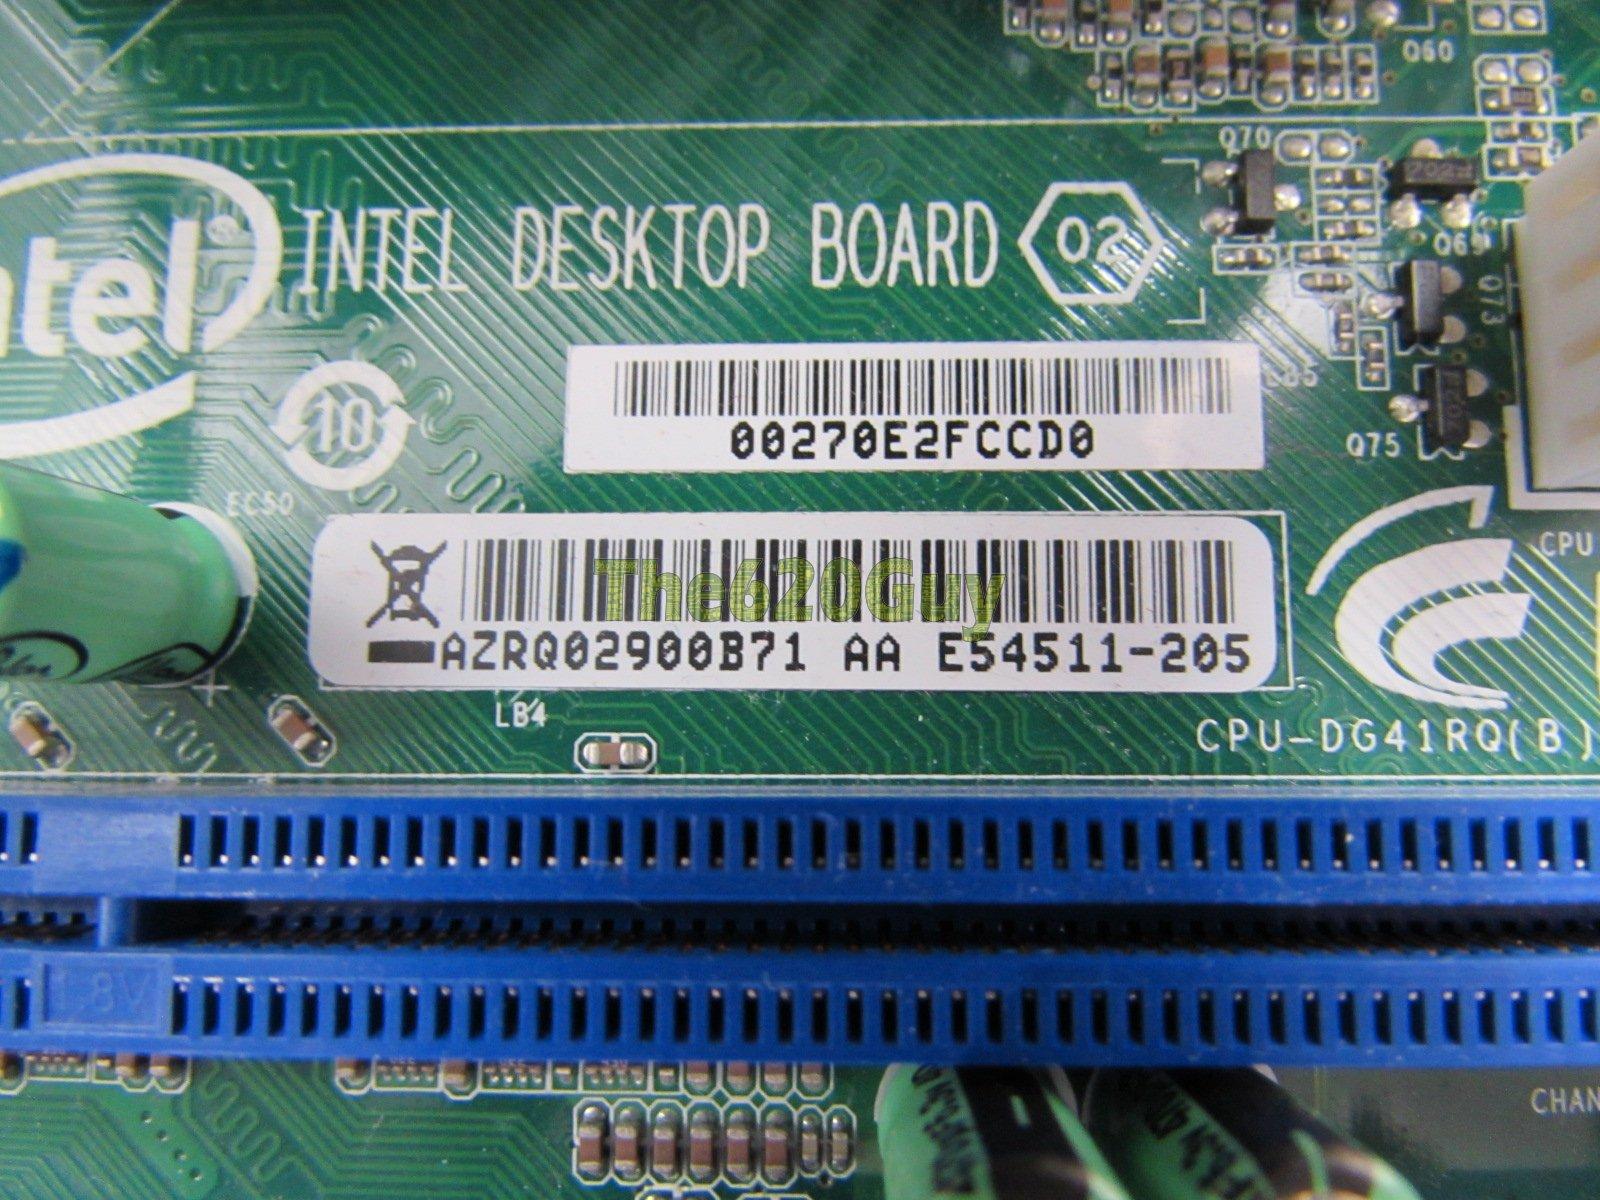 intel e210882 motherboard manual download